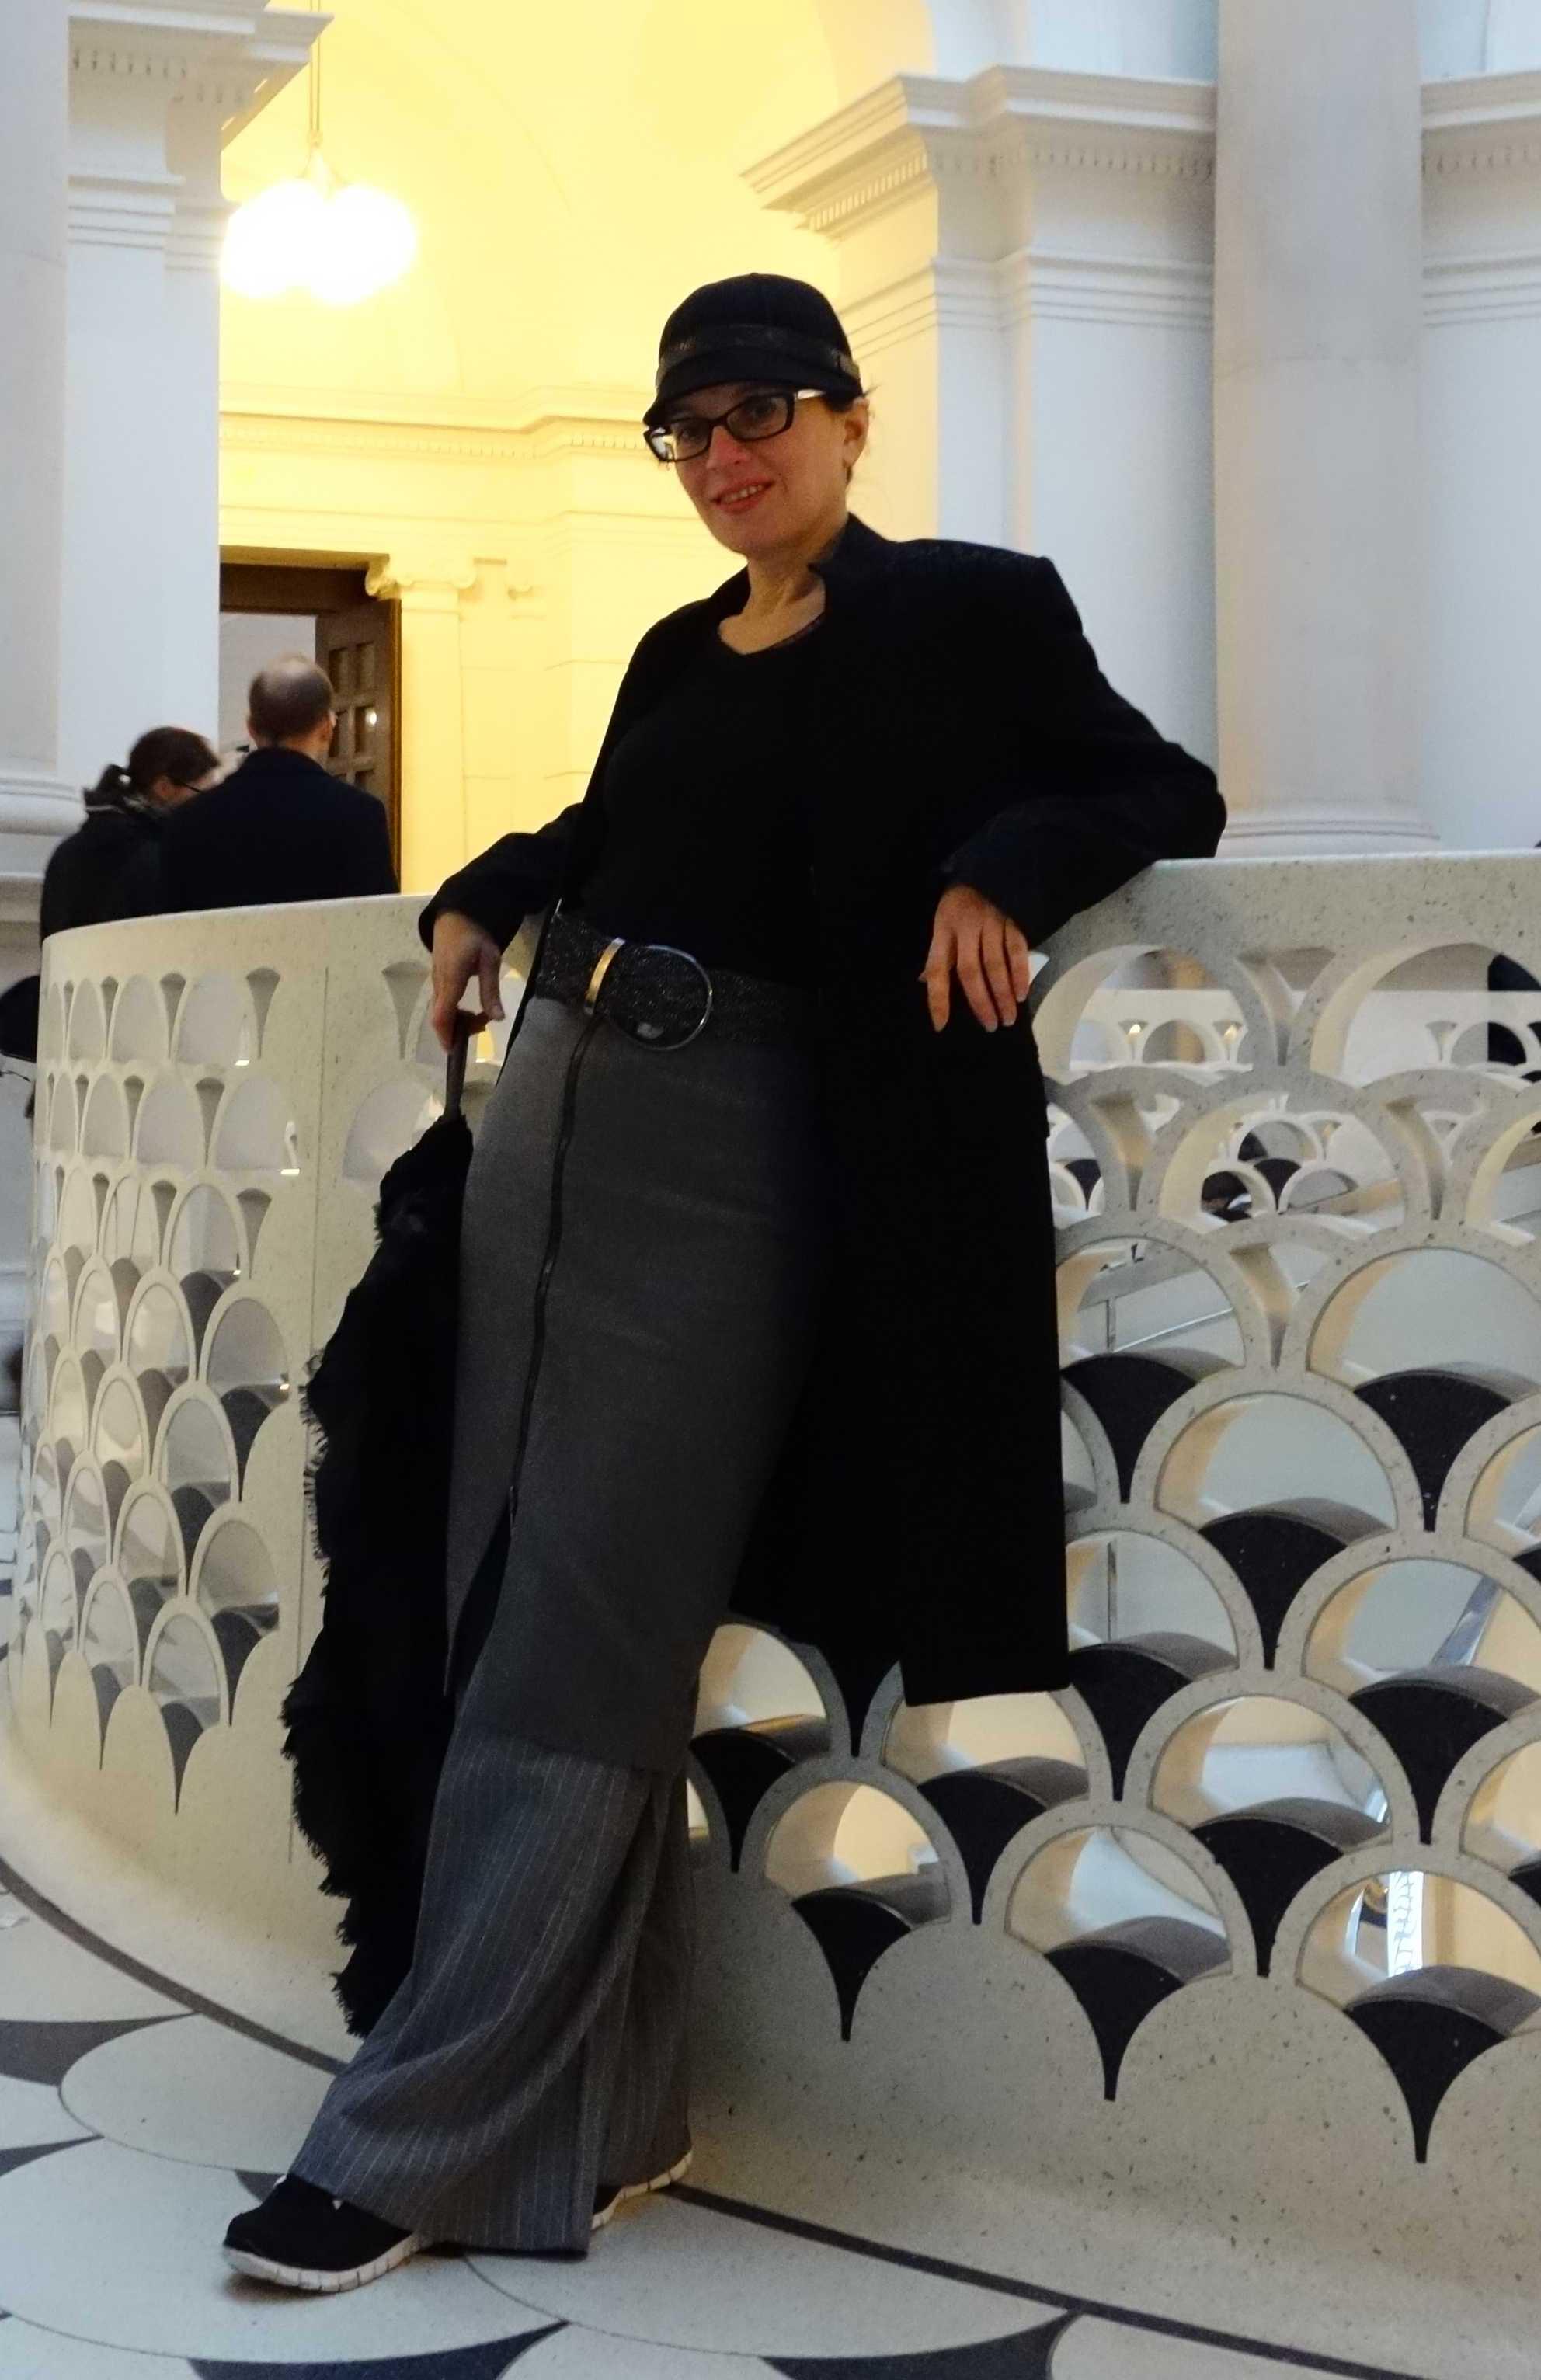 Event Companion photo Debra wearing pencil skirt over long-legged trousers